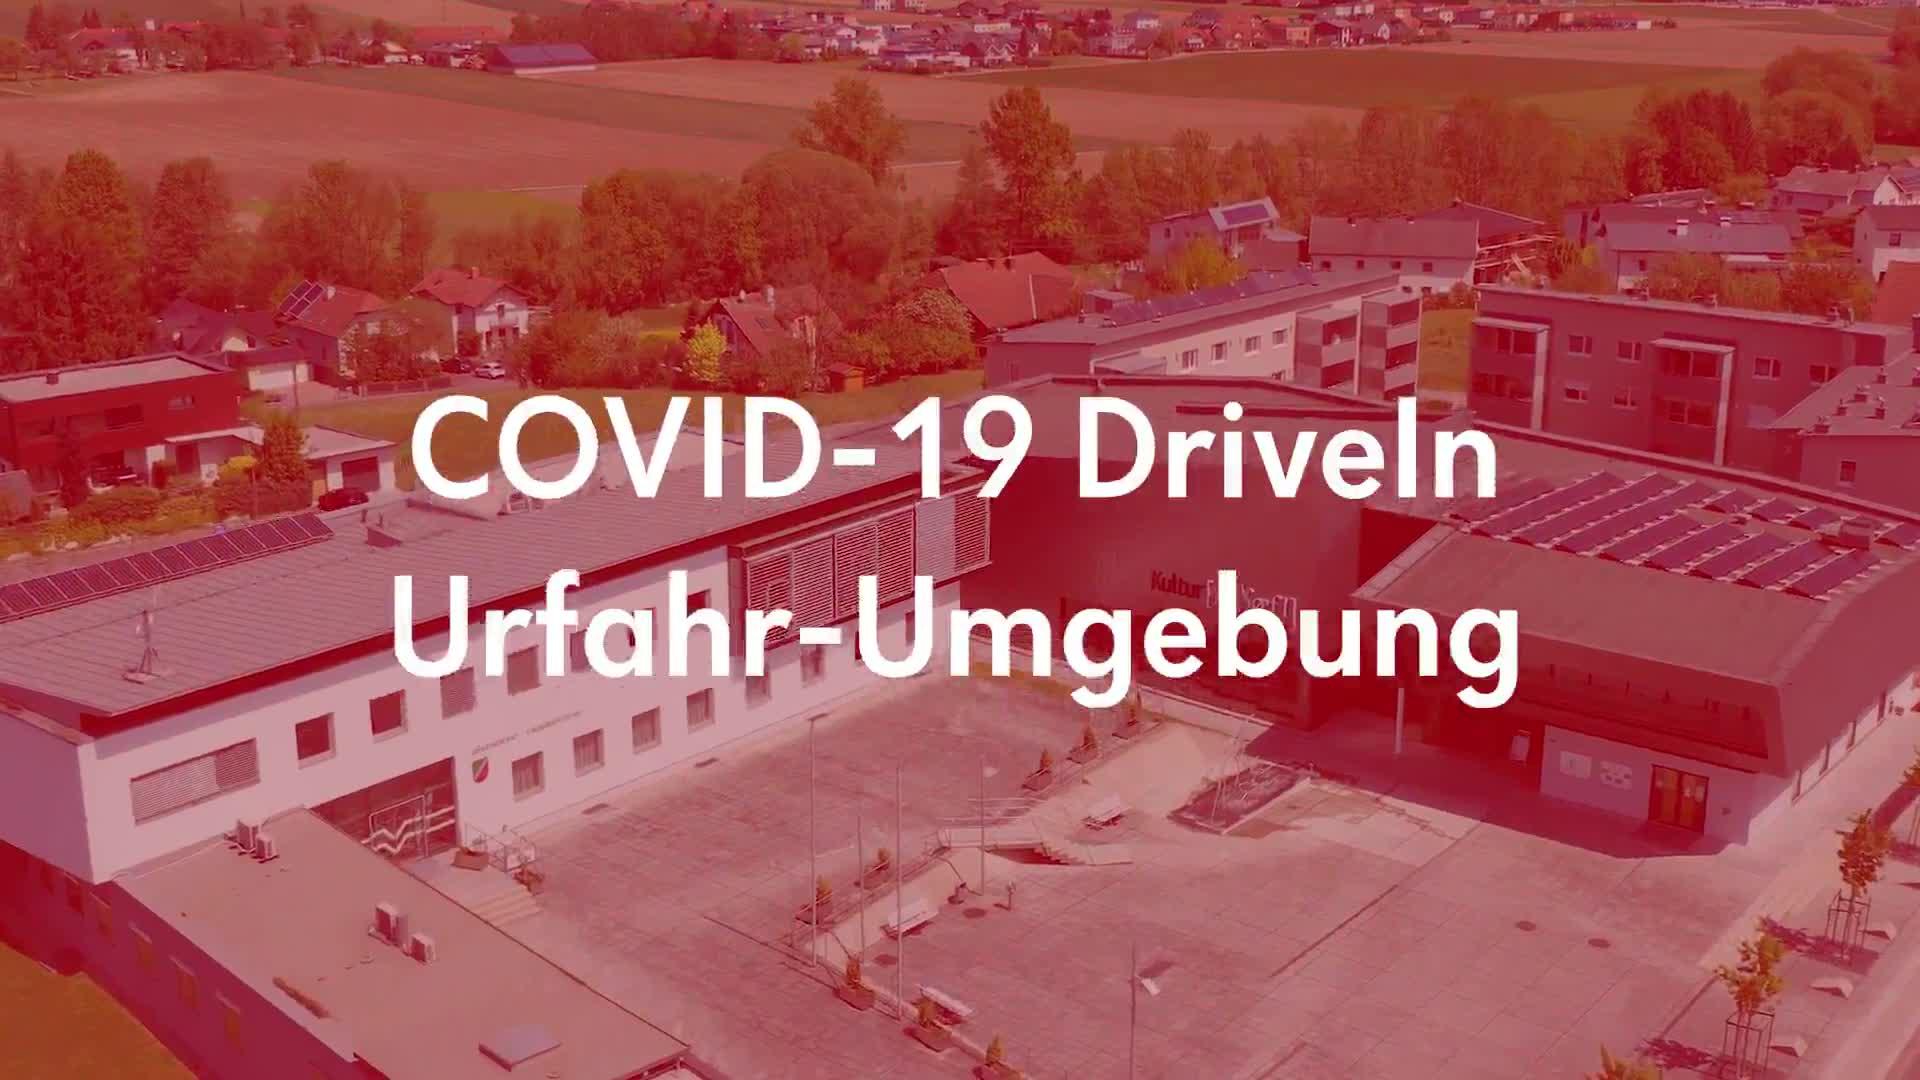 COVID-19 DriveIn in Engerwitzdorf